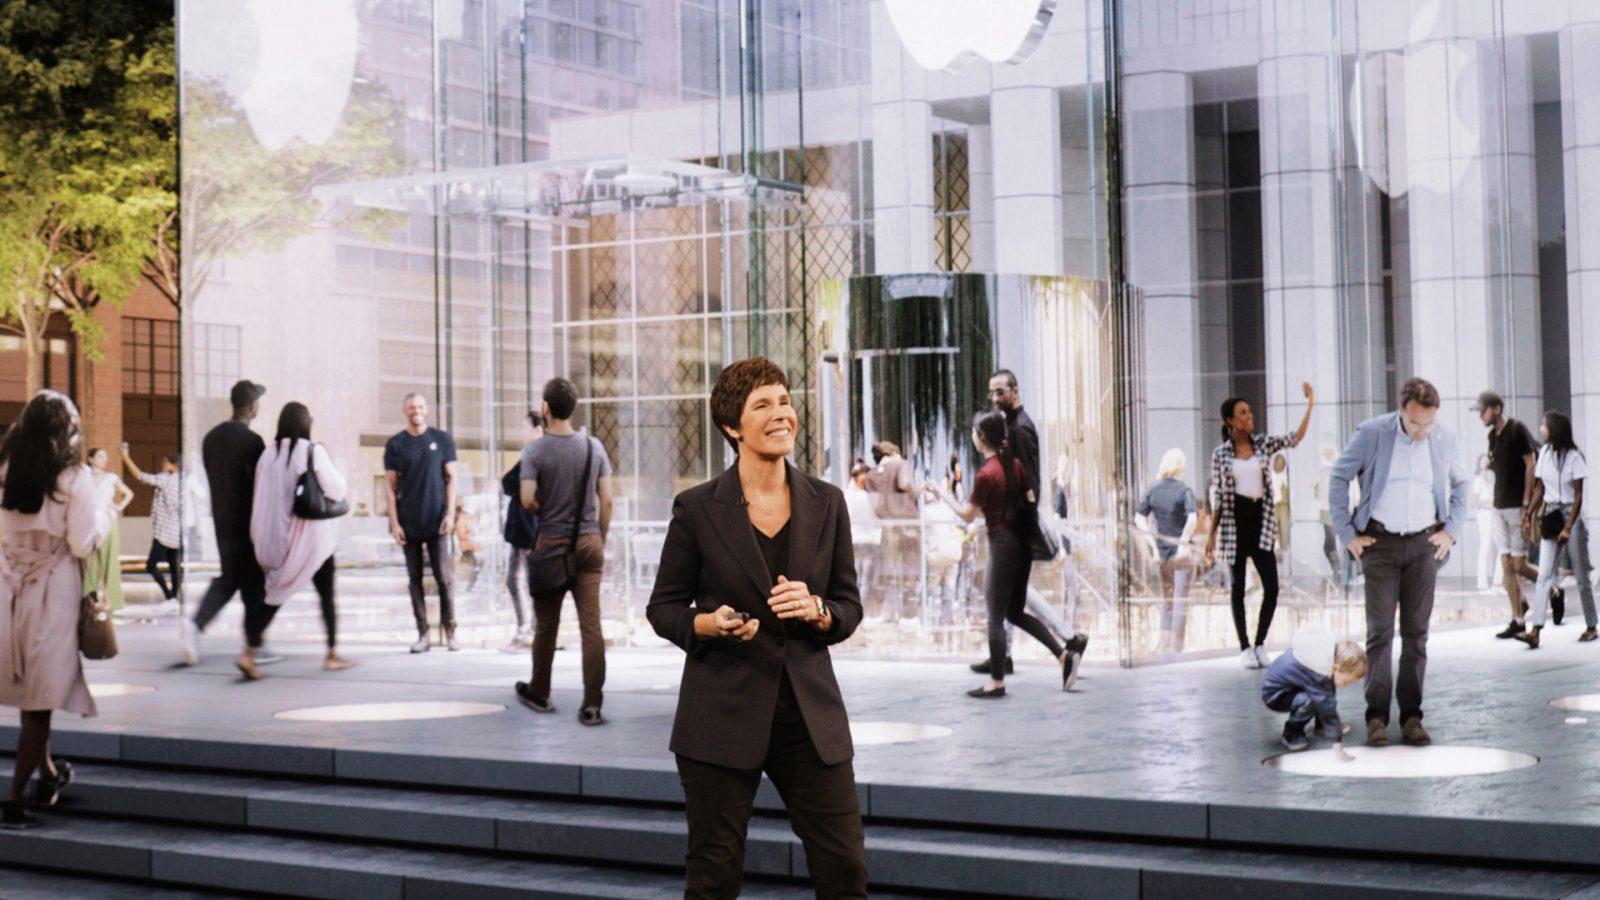 9to5Mac - Apple News & Mac Rumors Breaking All Day